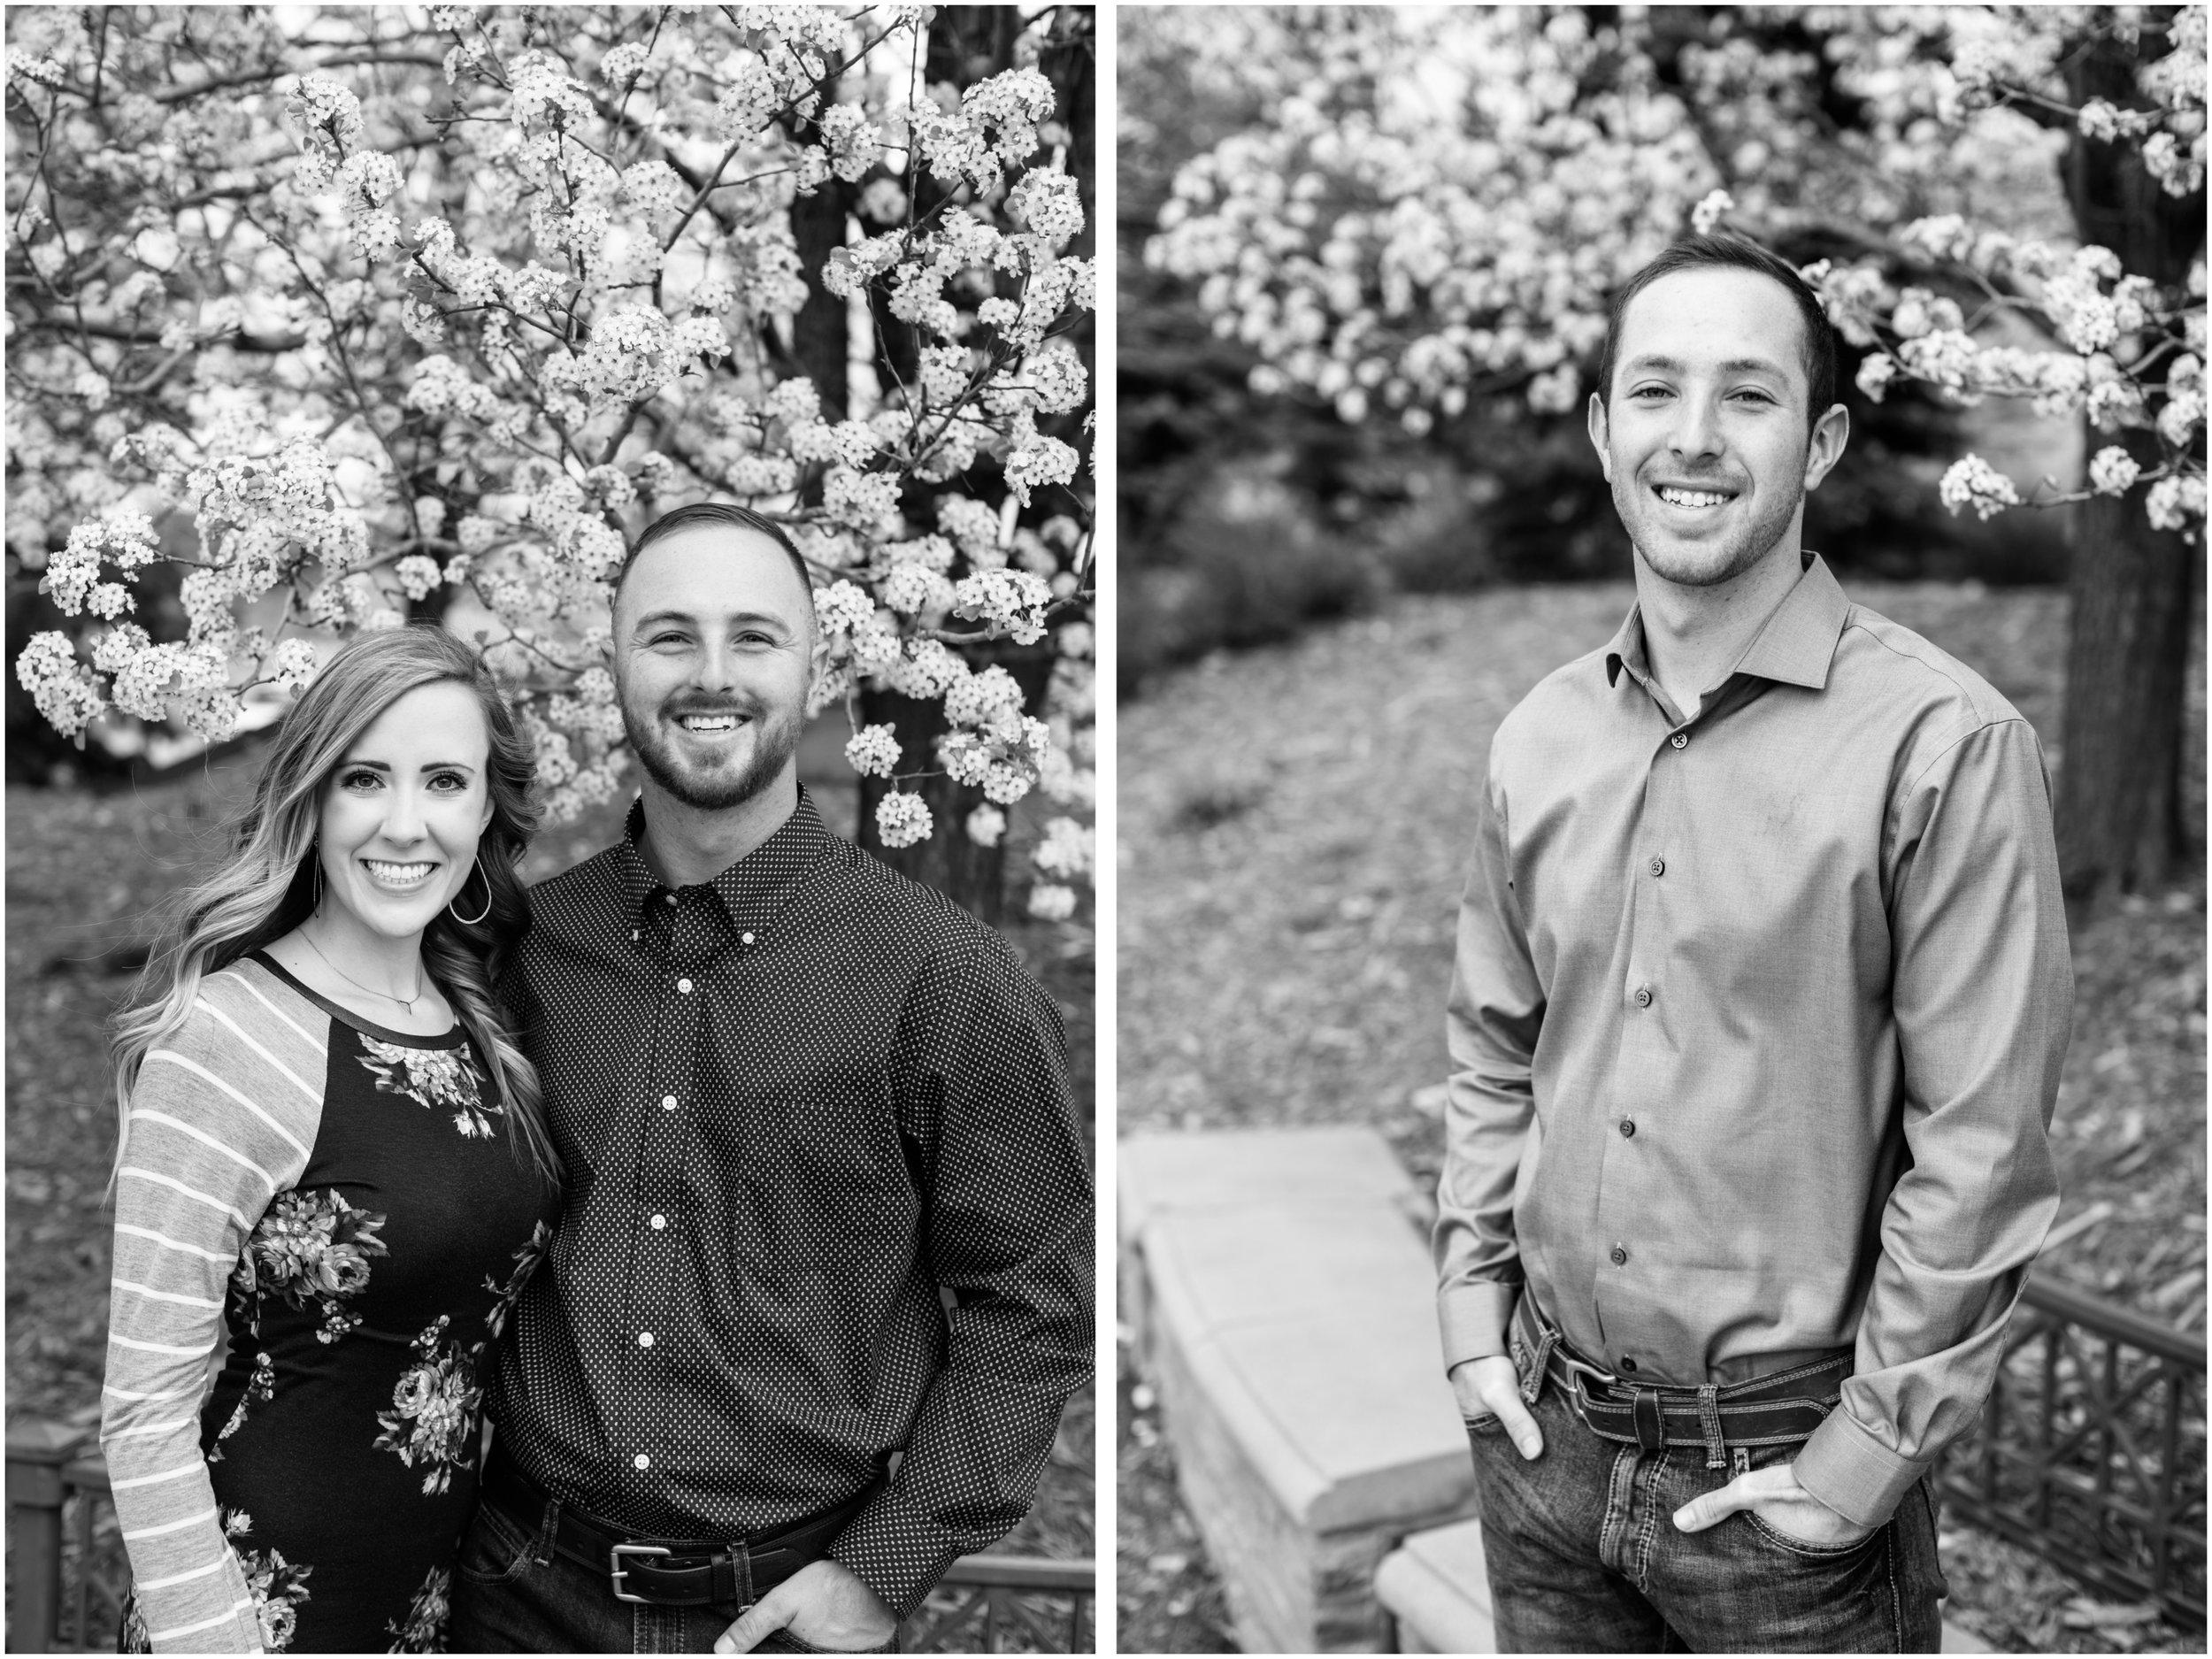 Colorado Springs Family Photographer 2.jpg